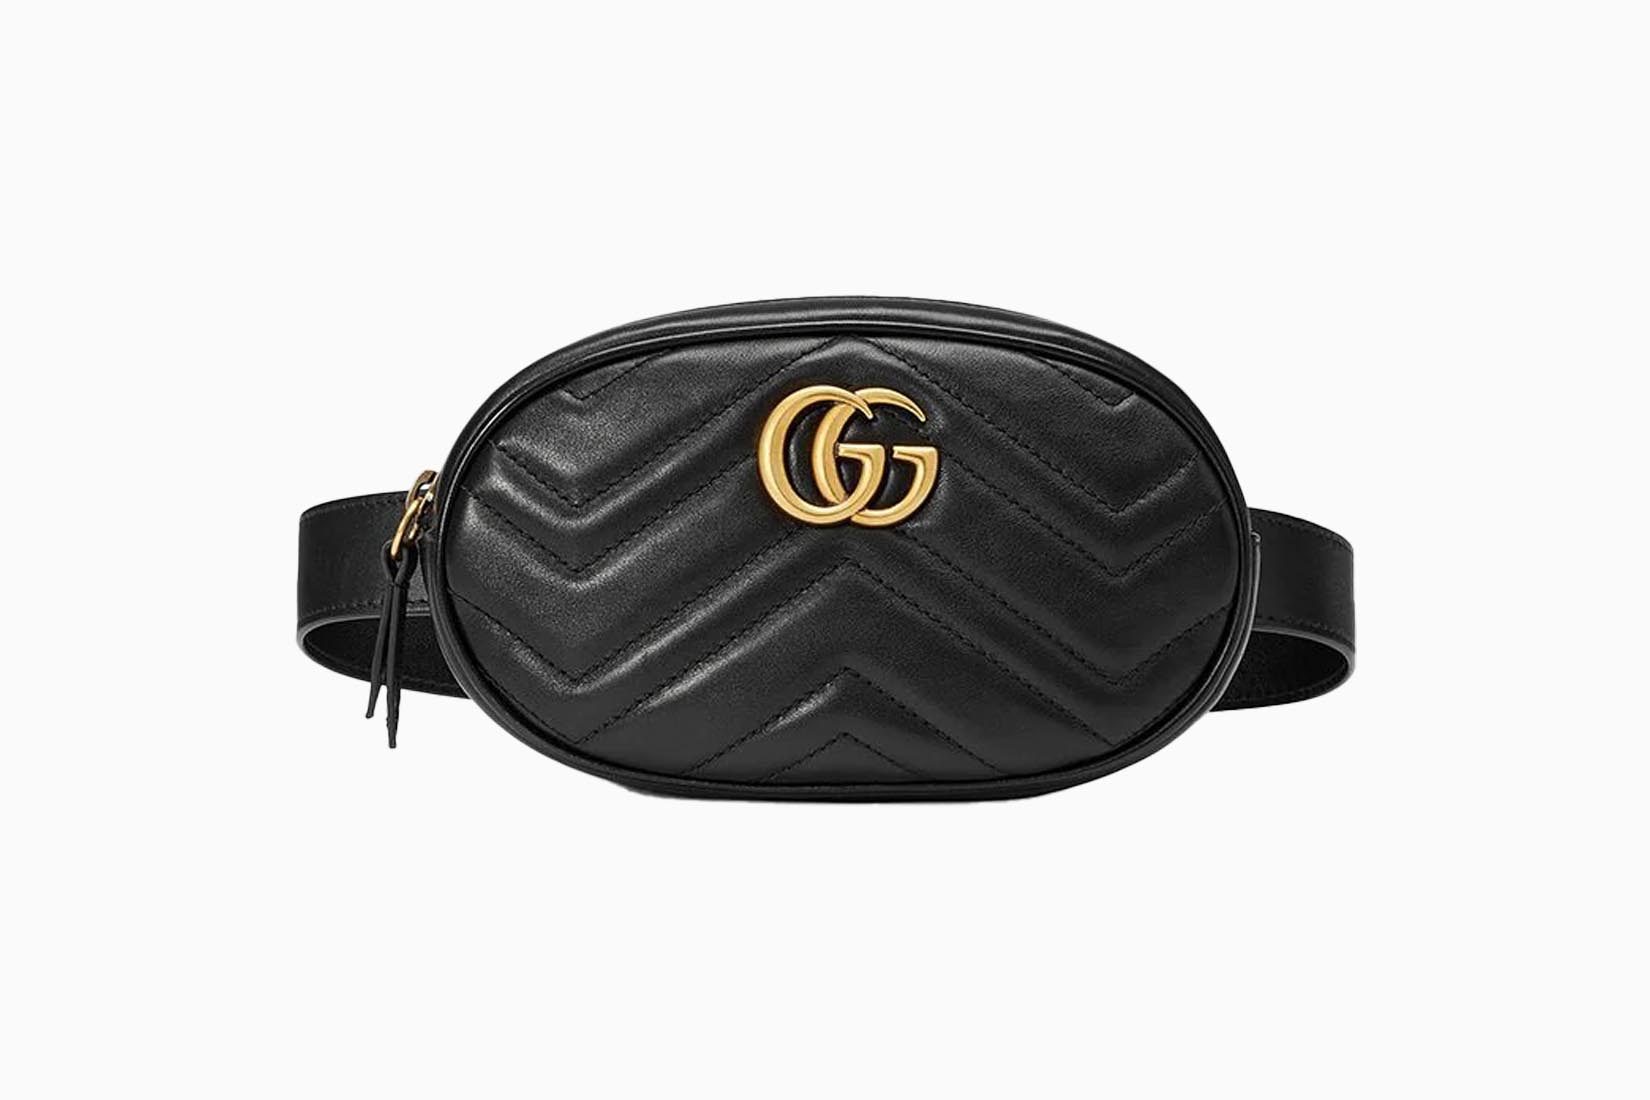 best belt bags women Gucci review Luxe Digital